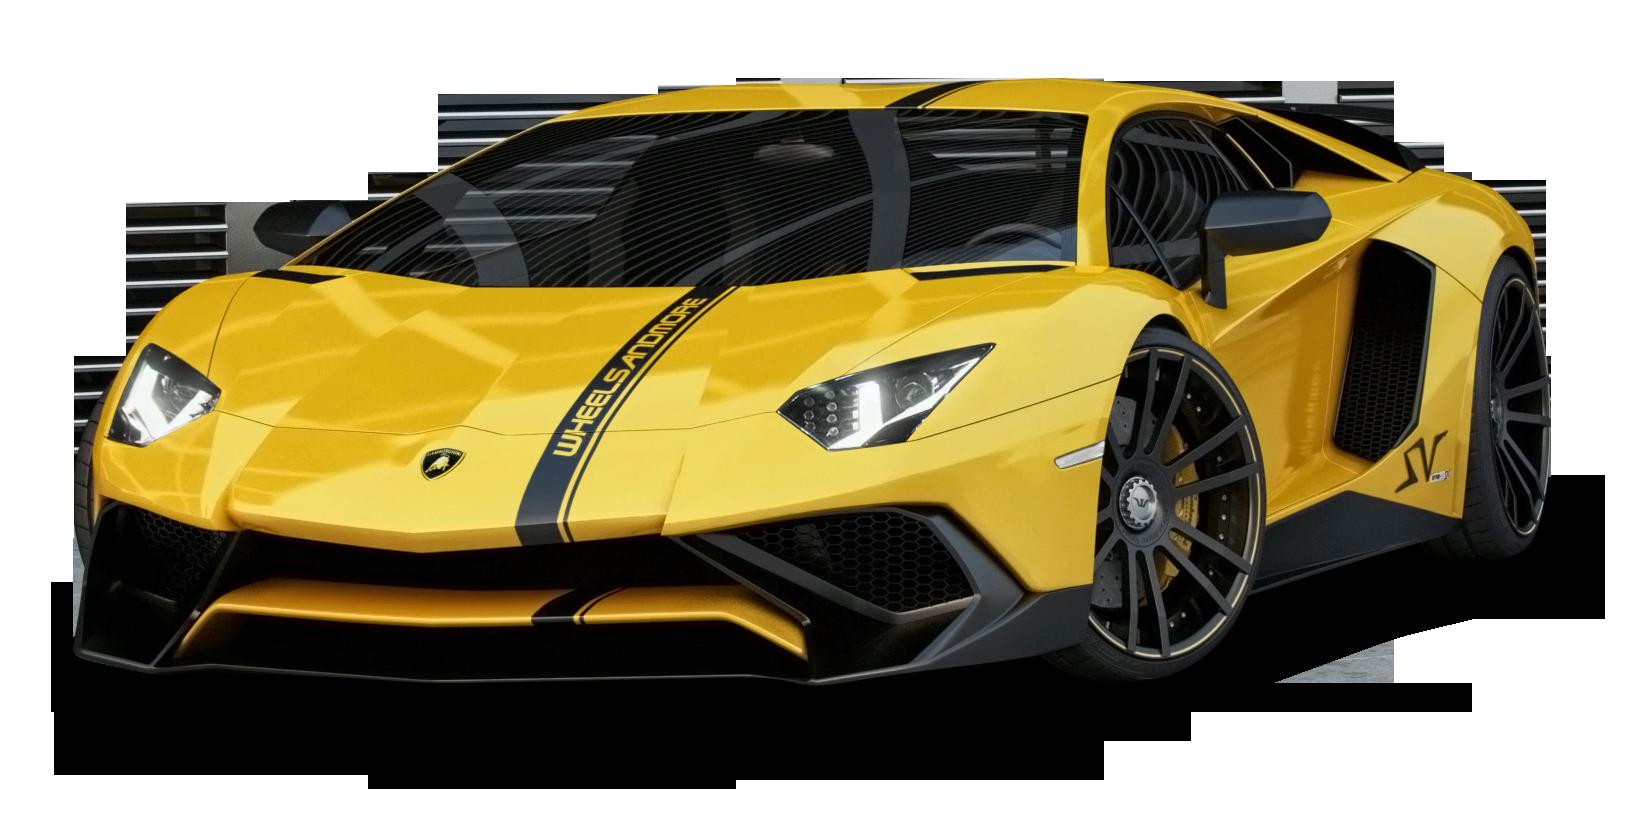 Yellow Lamborghini Aventador Car Png Image Lamborghini Lamborghini Aventador Car